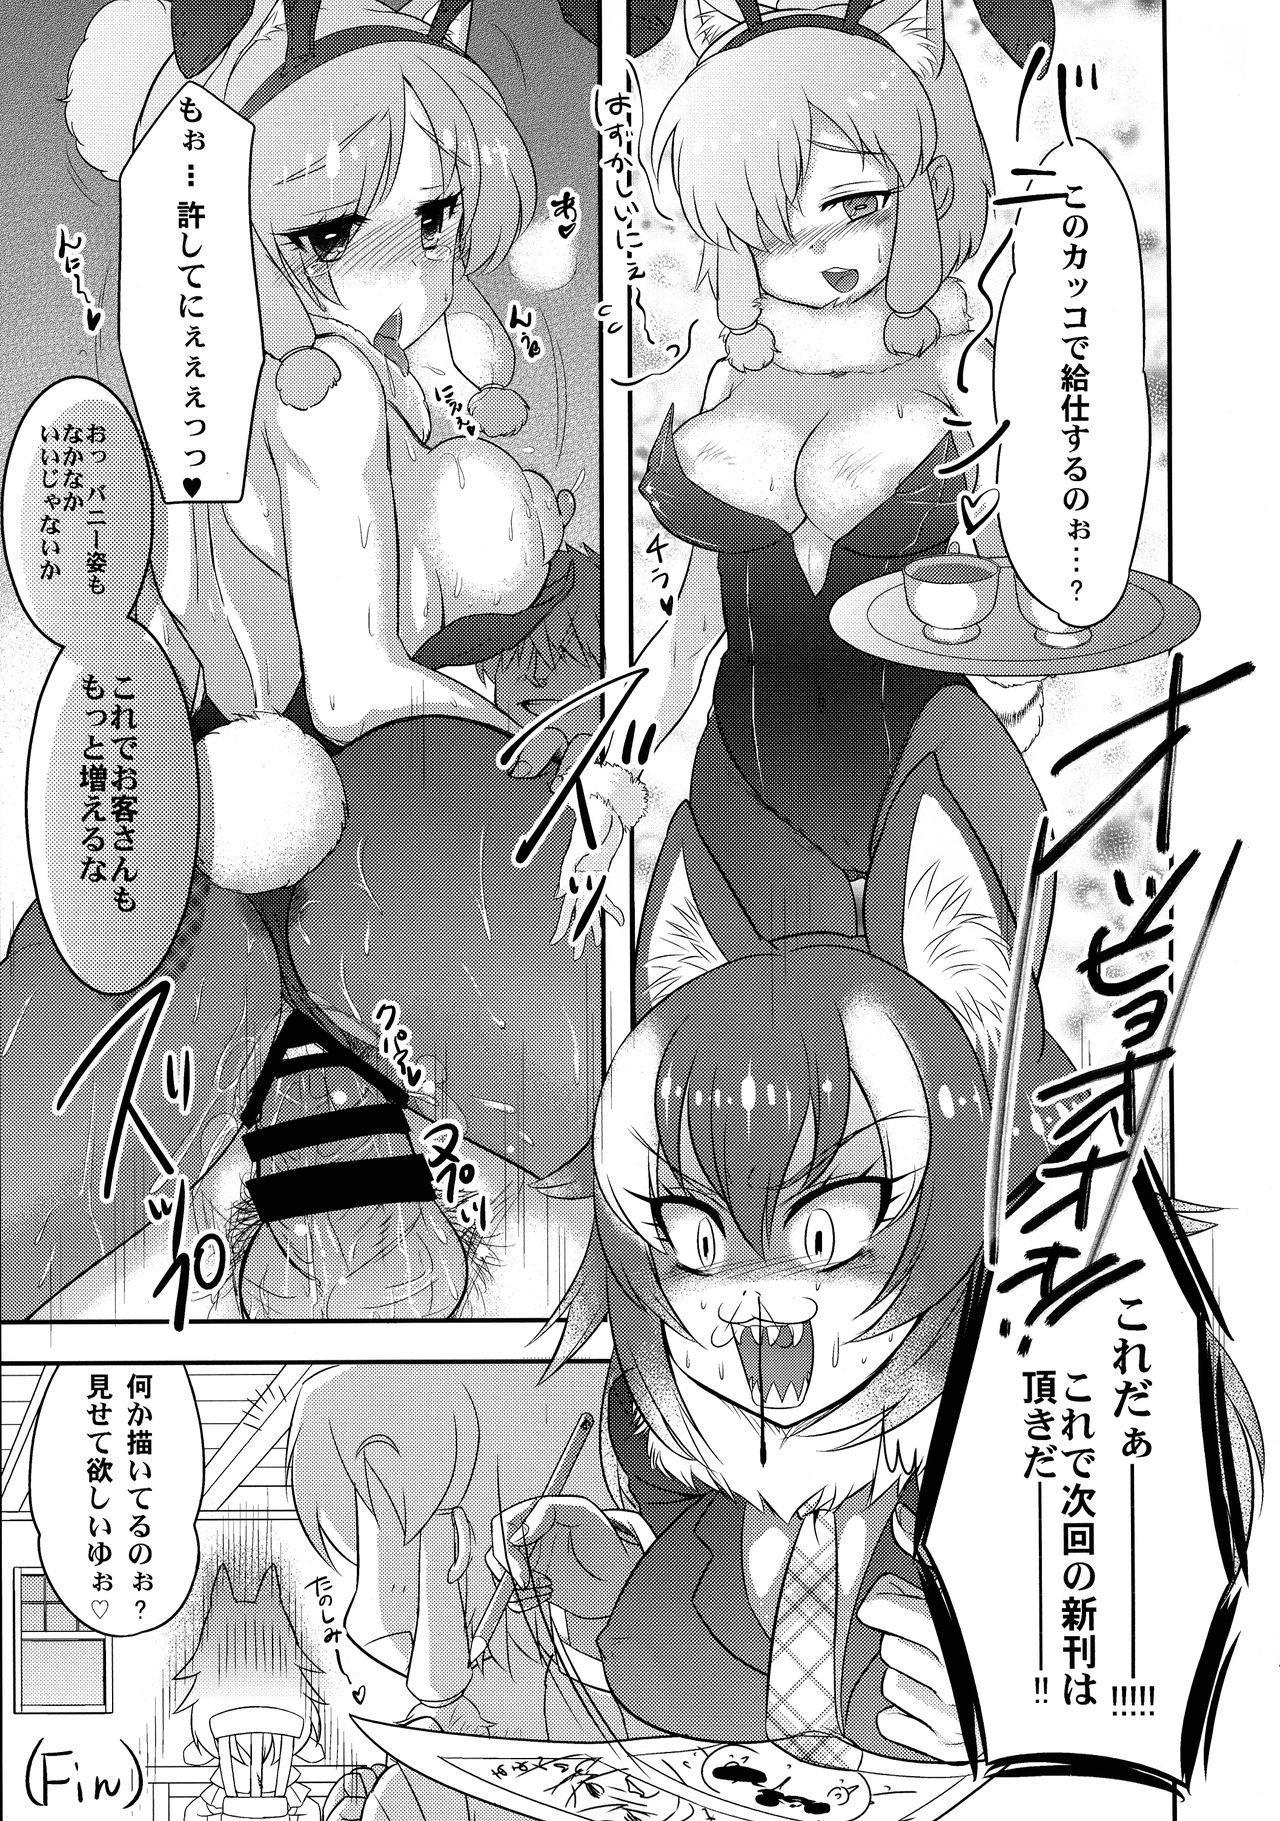 Fuwaaa! Irasshaai! Ura Iyashi no Alpaca-san Goudou 40